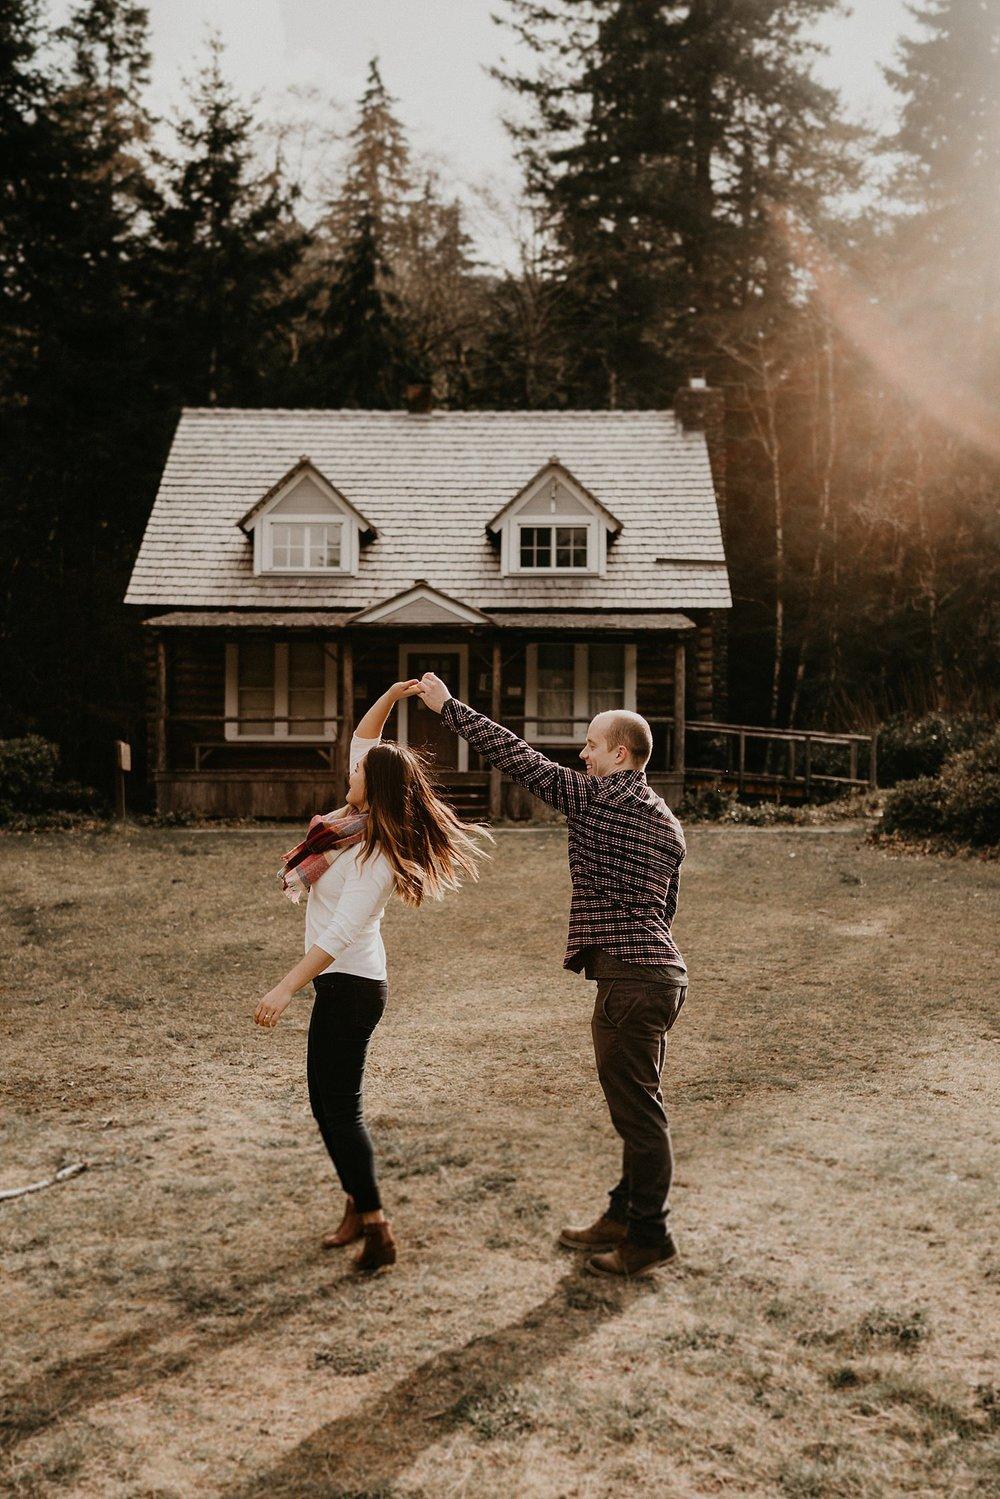 Lake-Crescent-Mount-Storm-King-Hiking-Adventure-Engagement-Seattle-Wedding-Photographer_0039.jpg